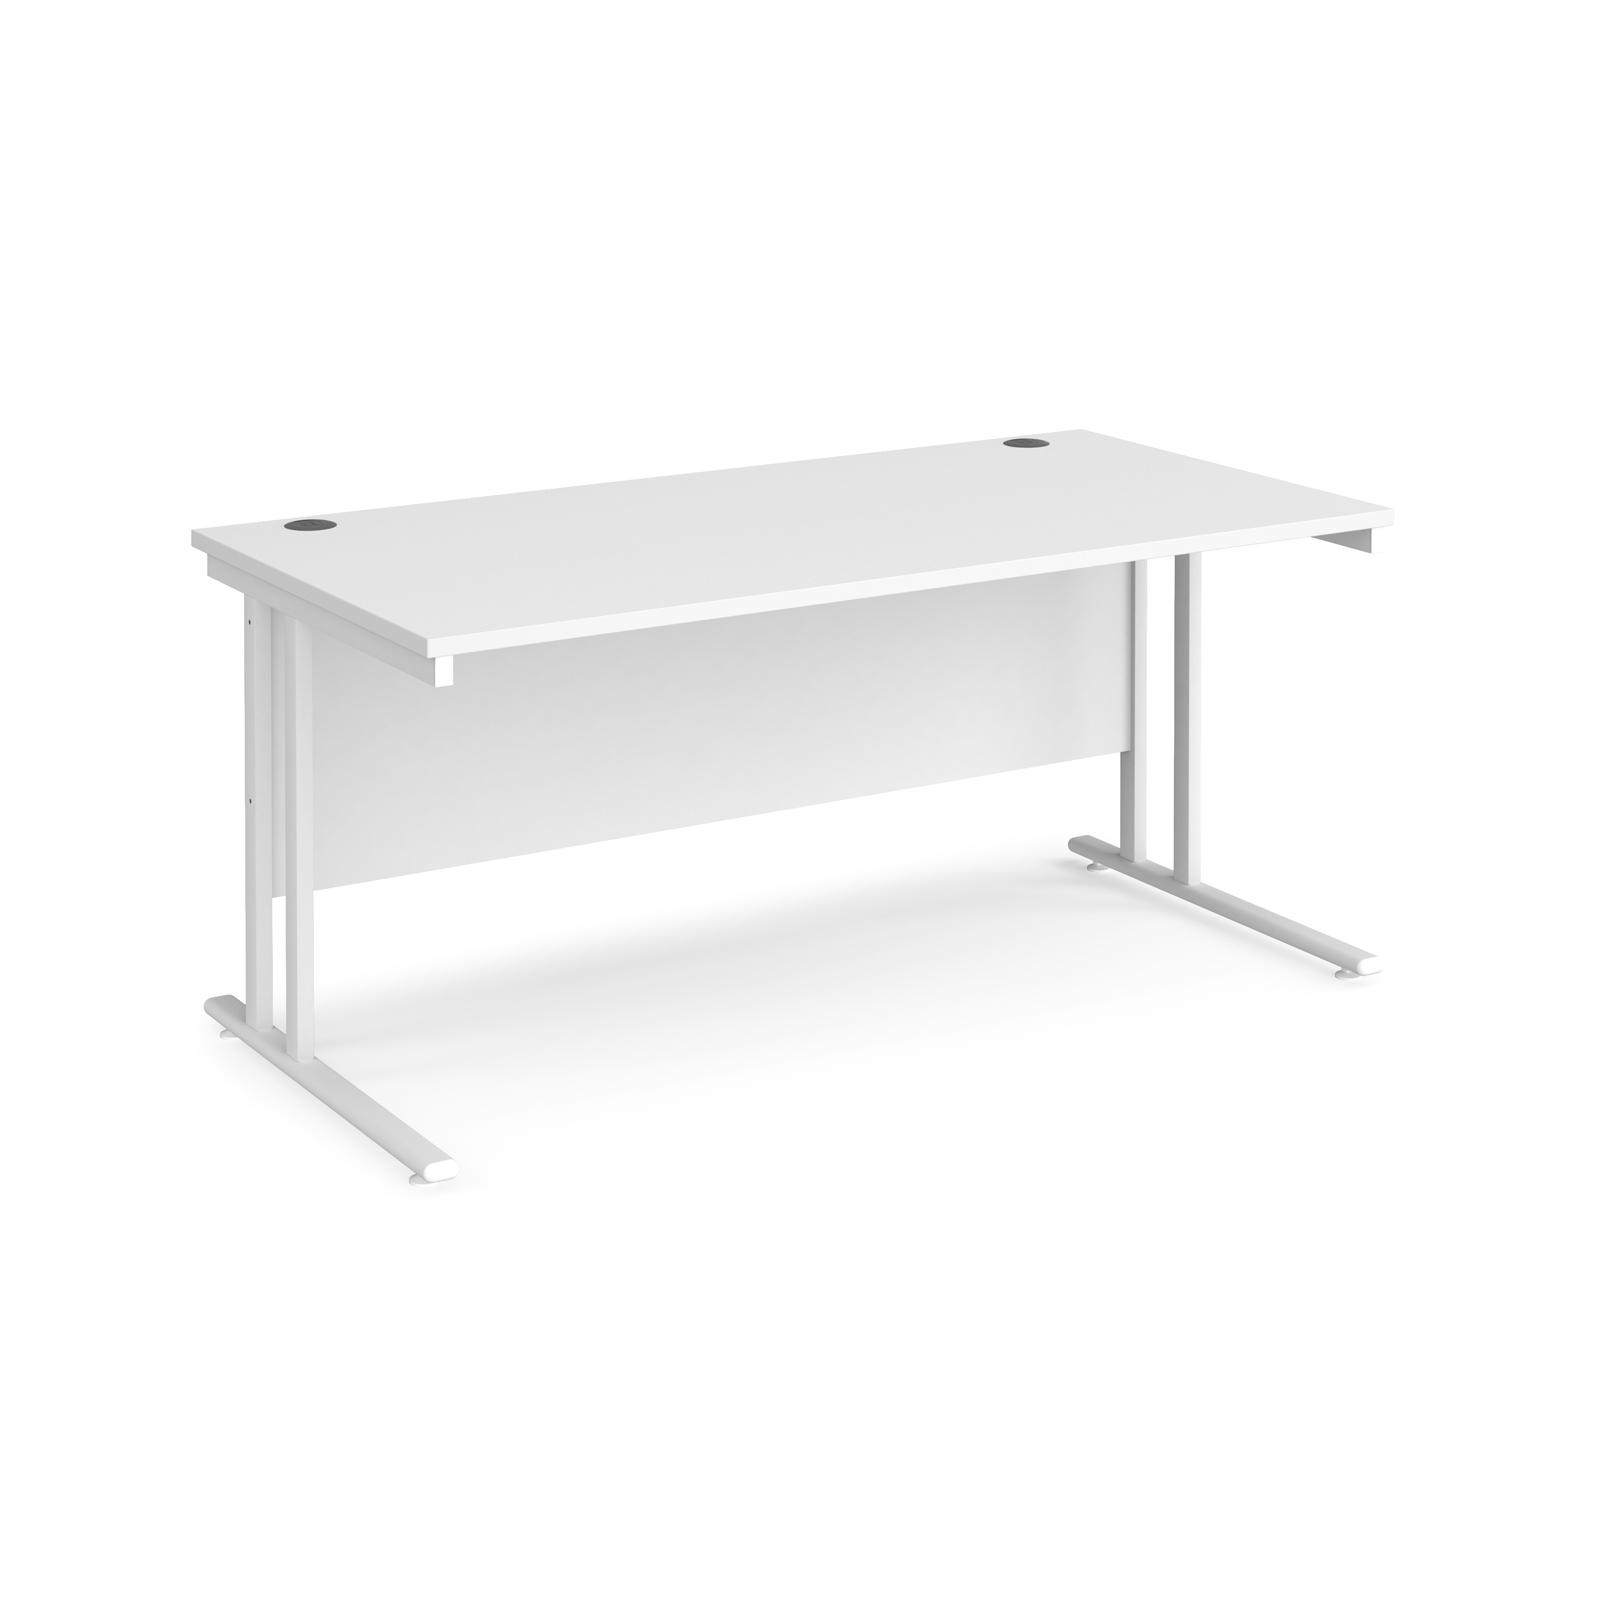 Maestro 25 WL straight desk 1600mm x 800mm - white cantilever frame, white top